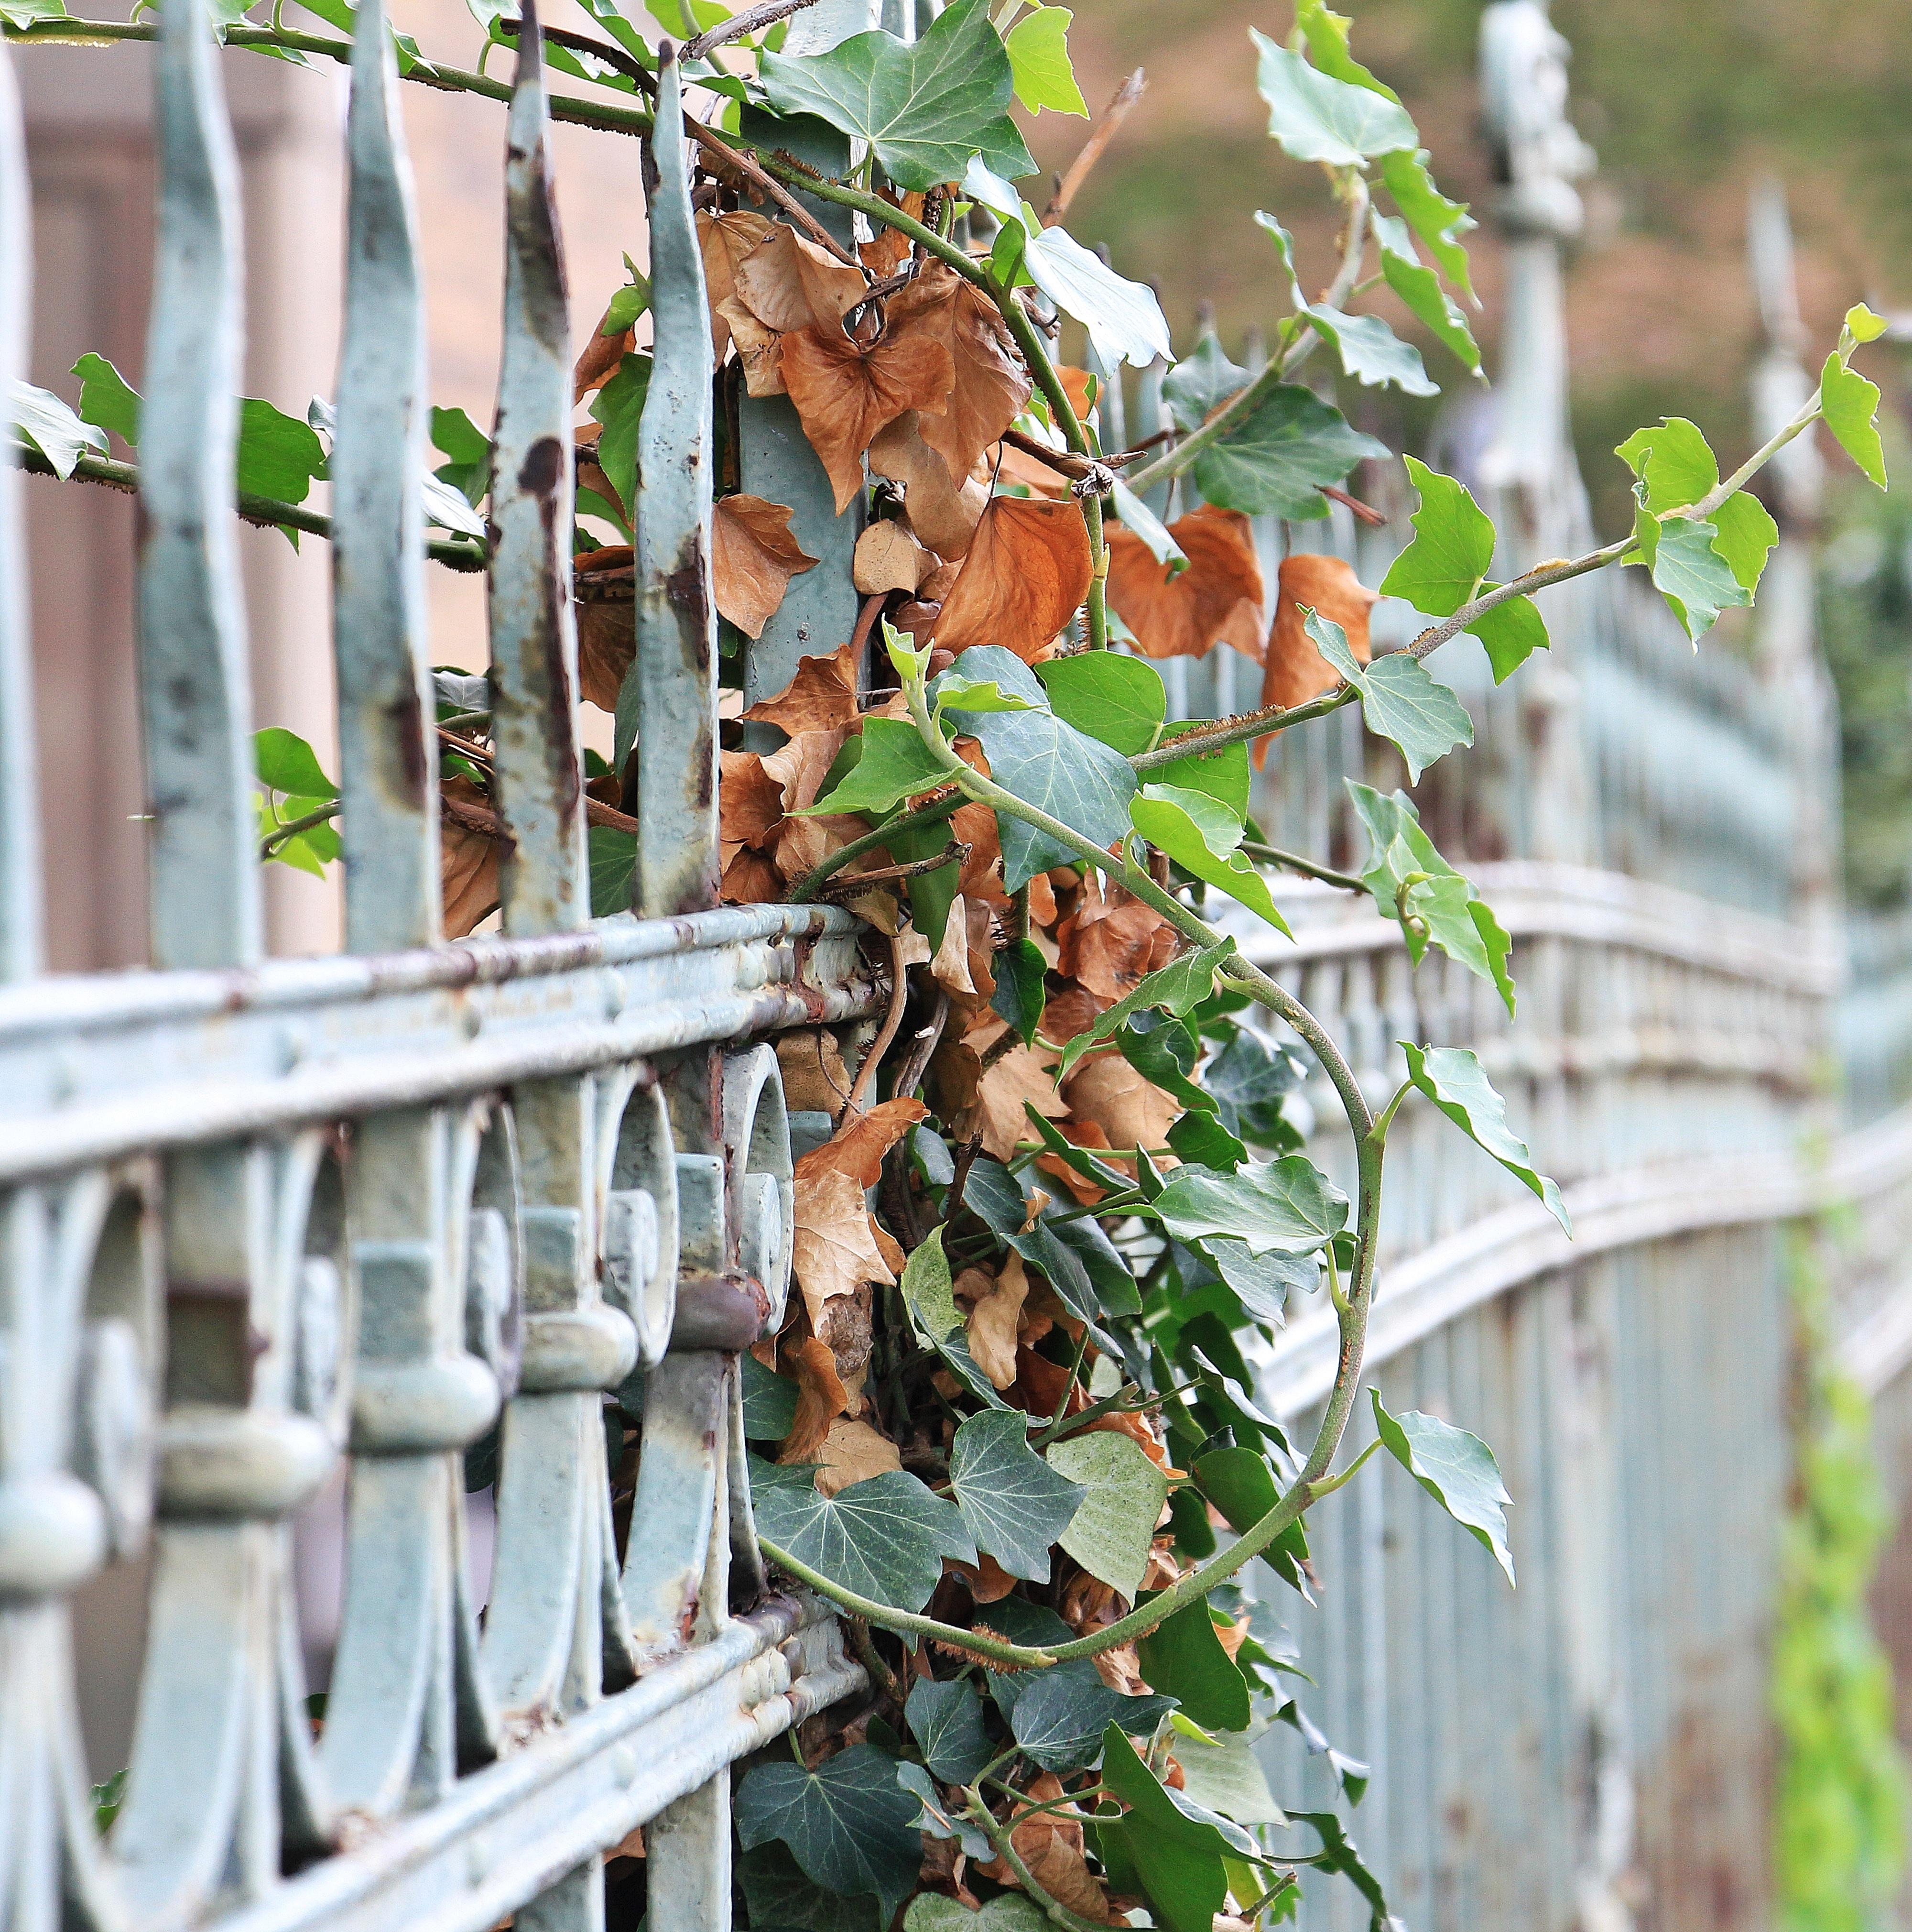 Kostenlose foto Baum Ast Zaun Blatt Blume alt Lebensmittel